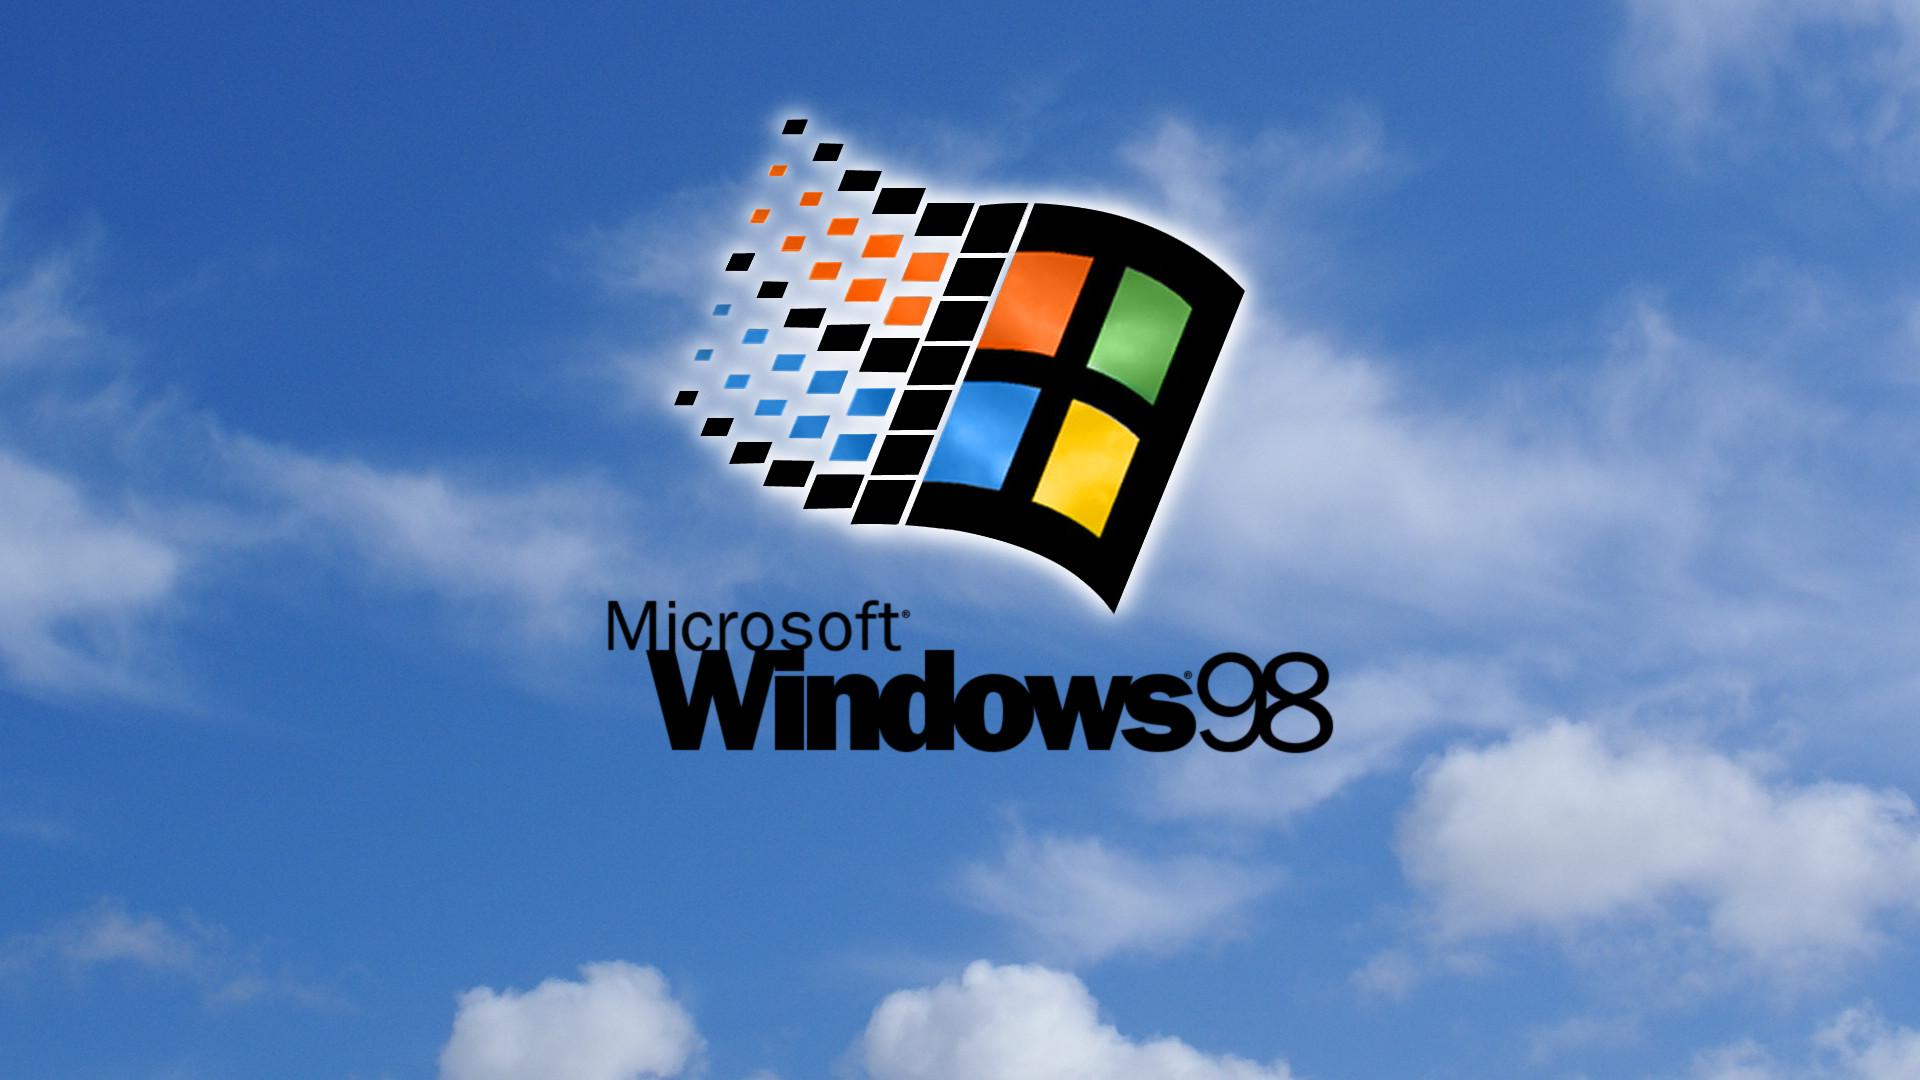 Windows NT Source Code Image